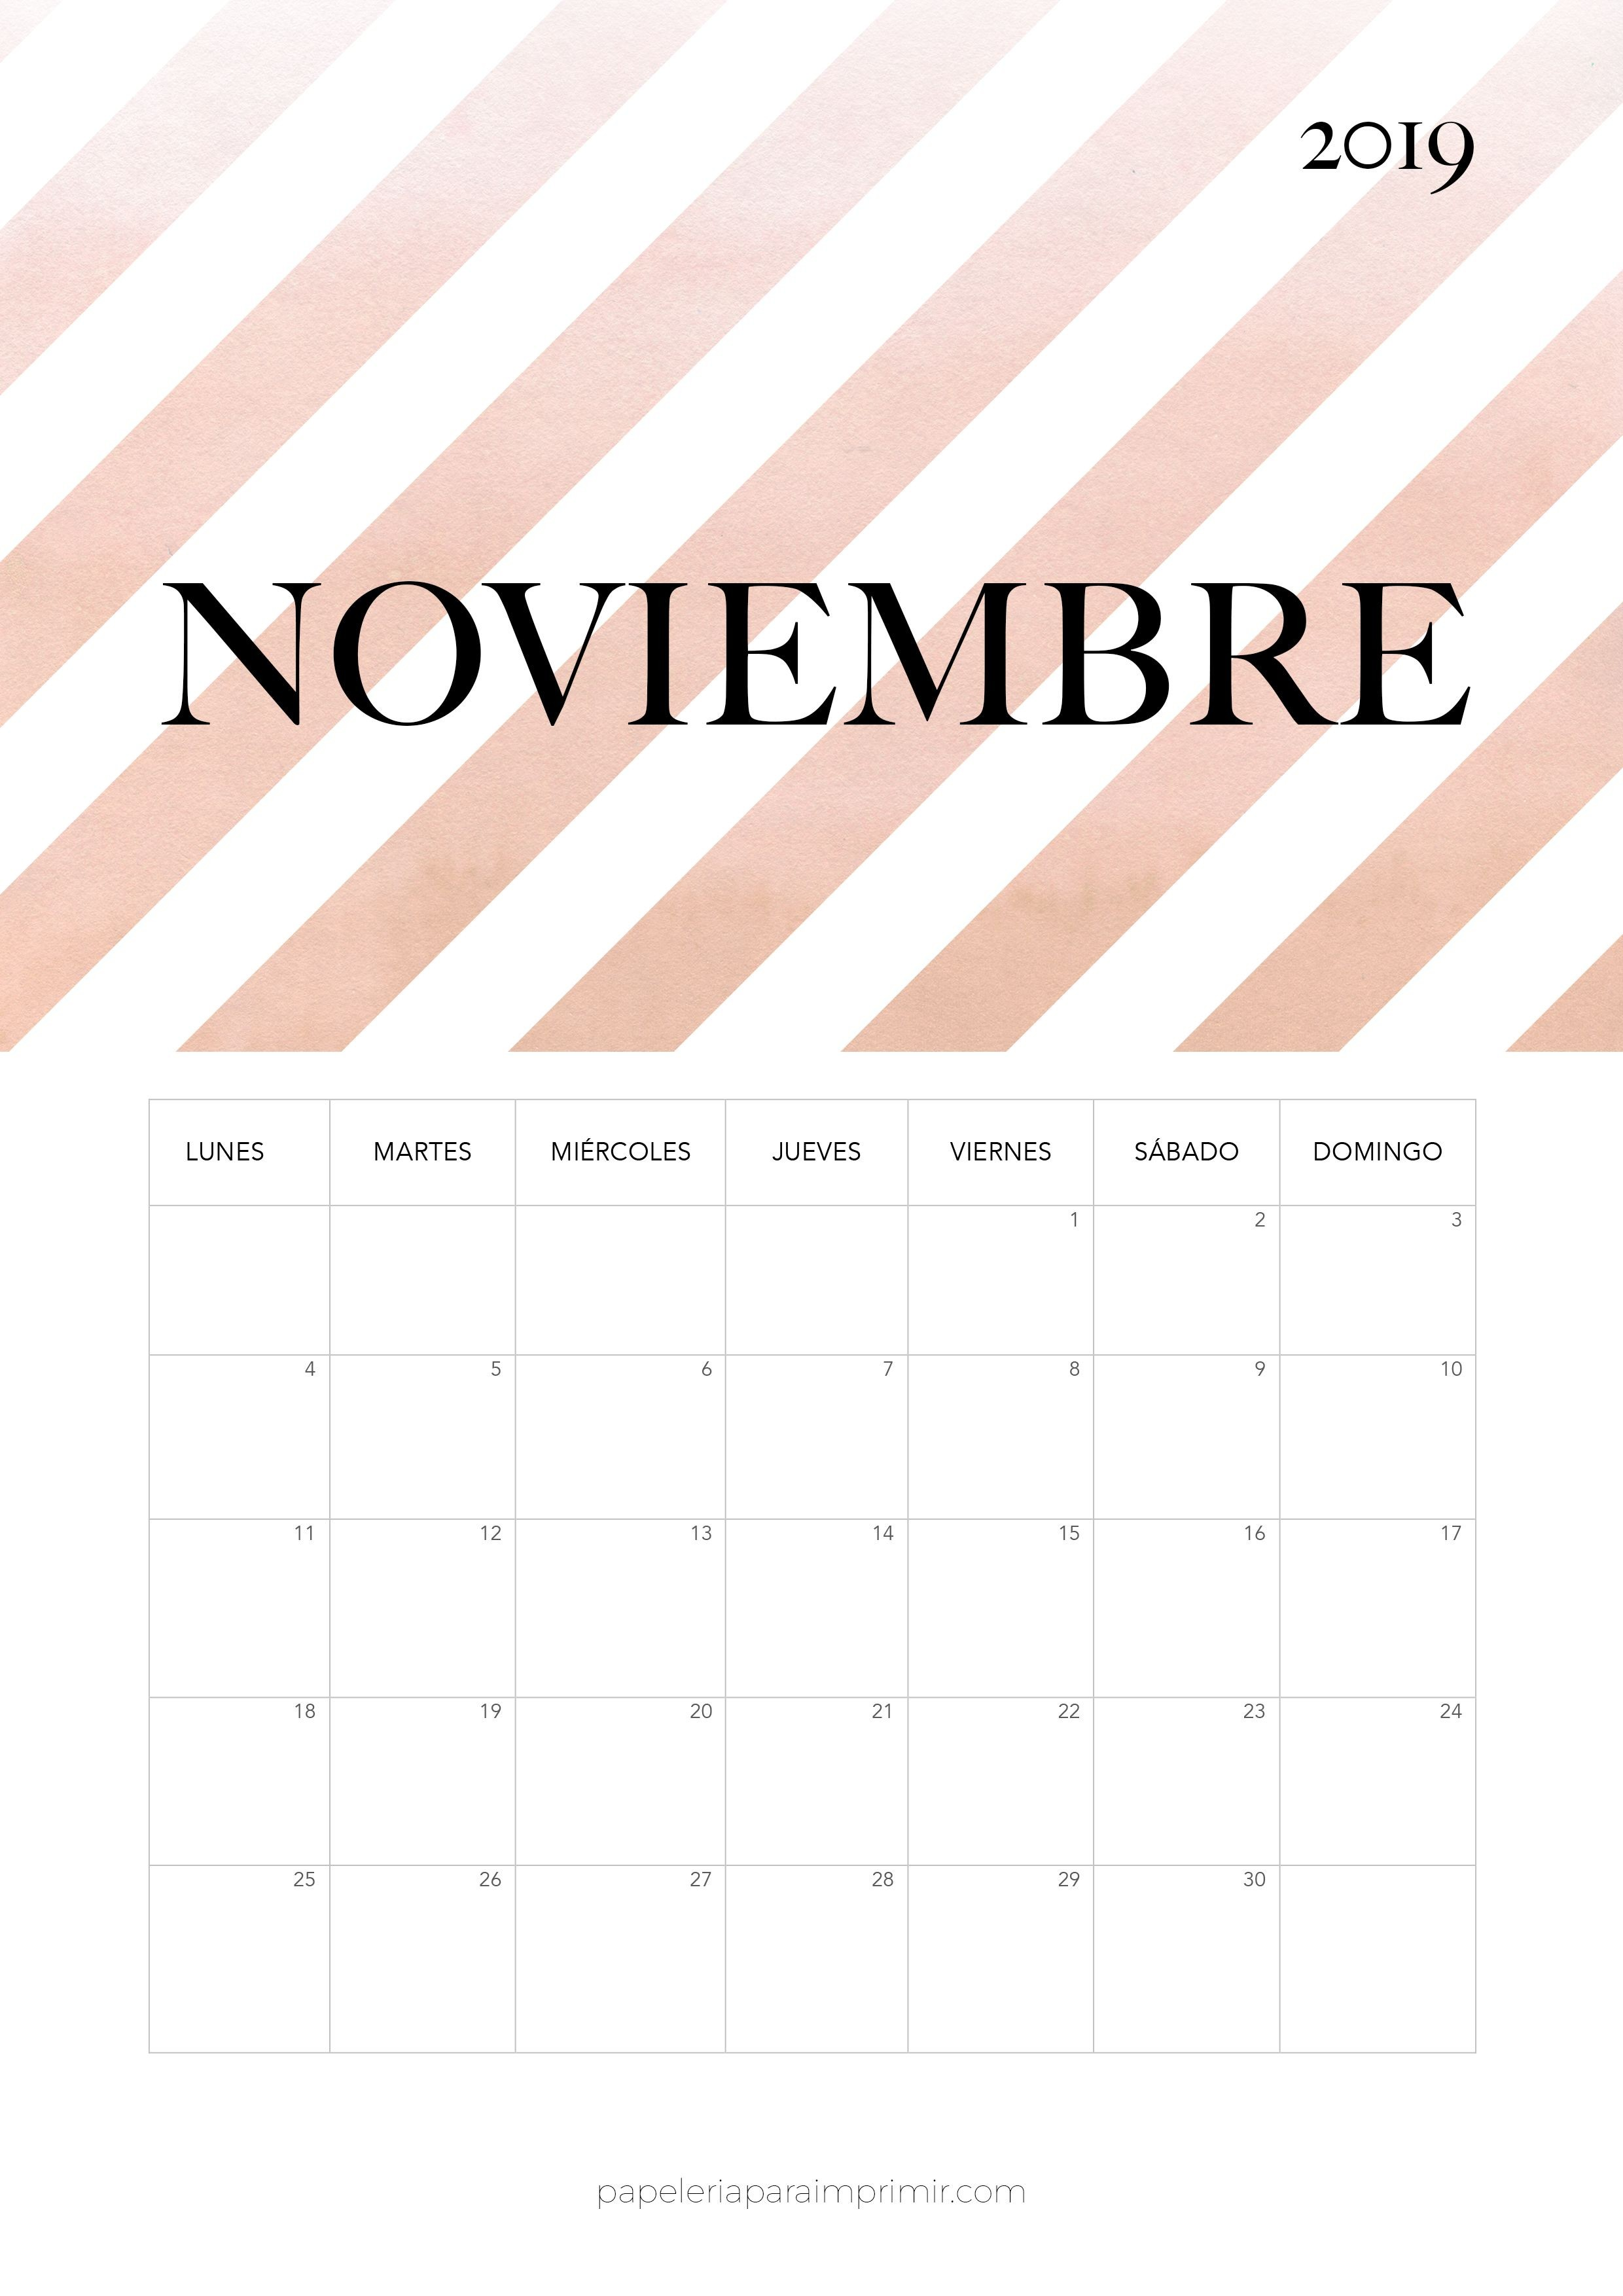 Calendario 2017 Para Imprimir Por Mes Diciembre Más Recientemente Liberado Pin De Aeuniceva En Imprimibles Portadas De Agendas Of Calendario 2017 Para Imprimir Por Mes Diciembre Más Reciente Calendarios Navideos Calendarios De Y Fondos De Pantalla